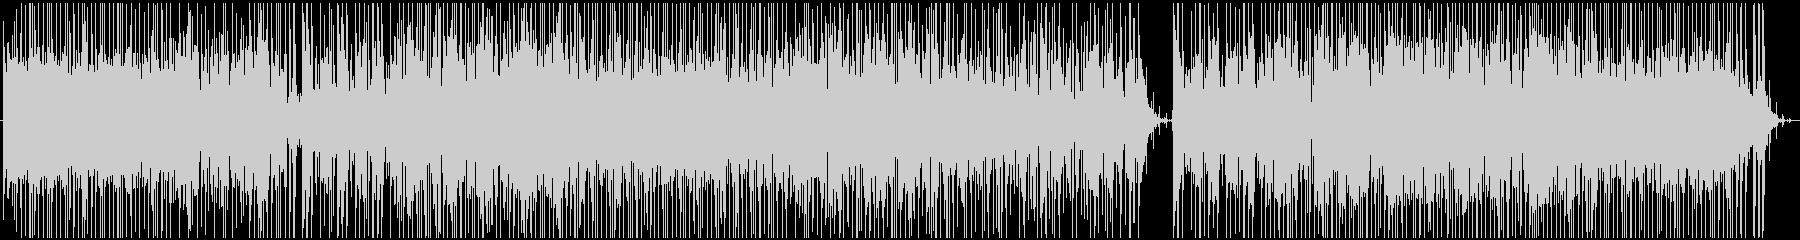 KYOTOの未再生の波形